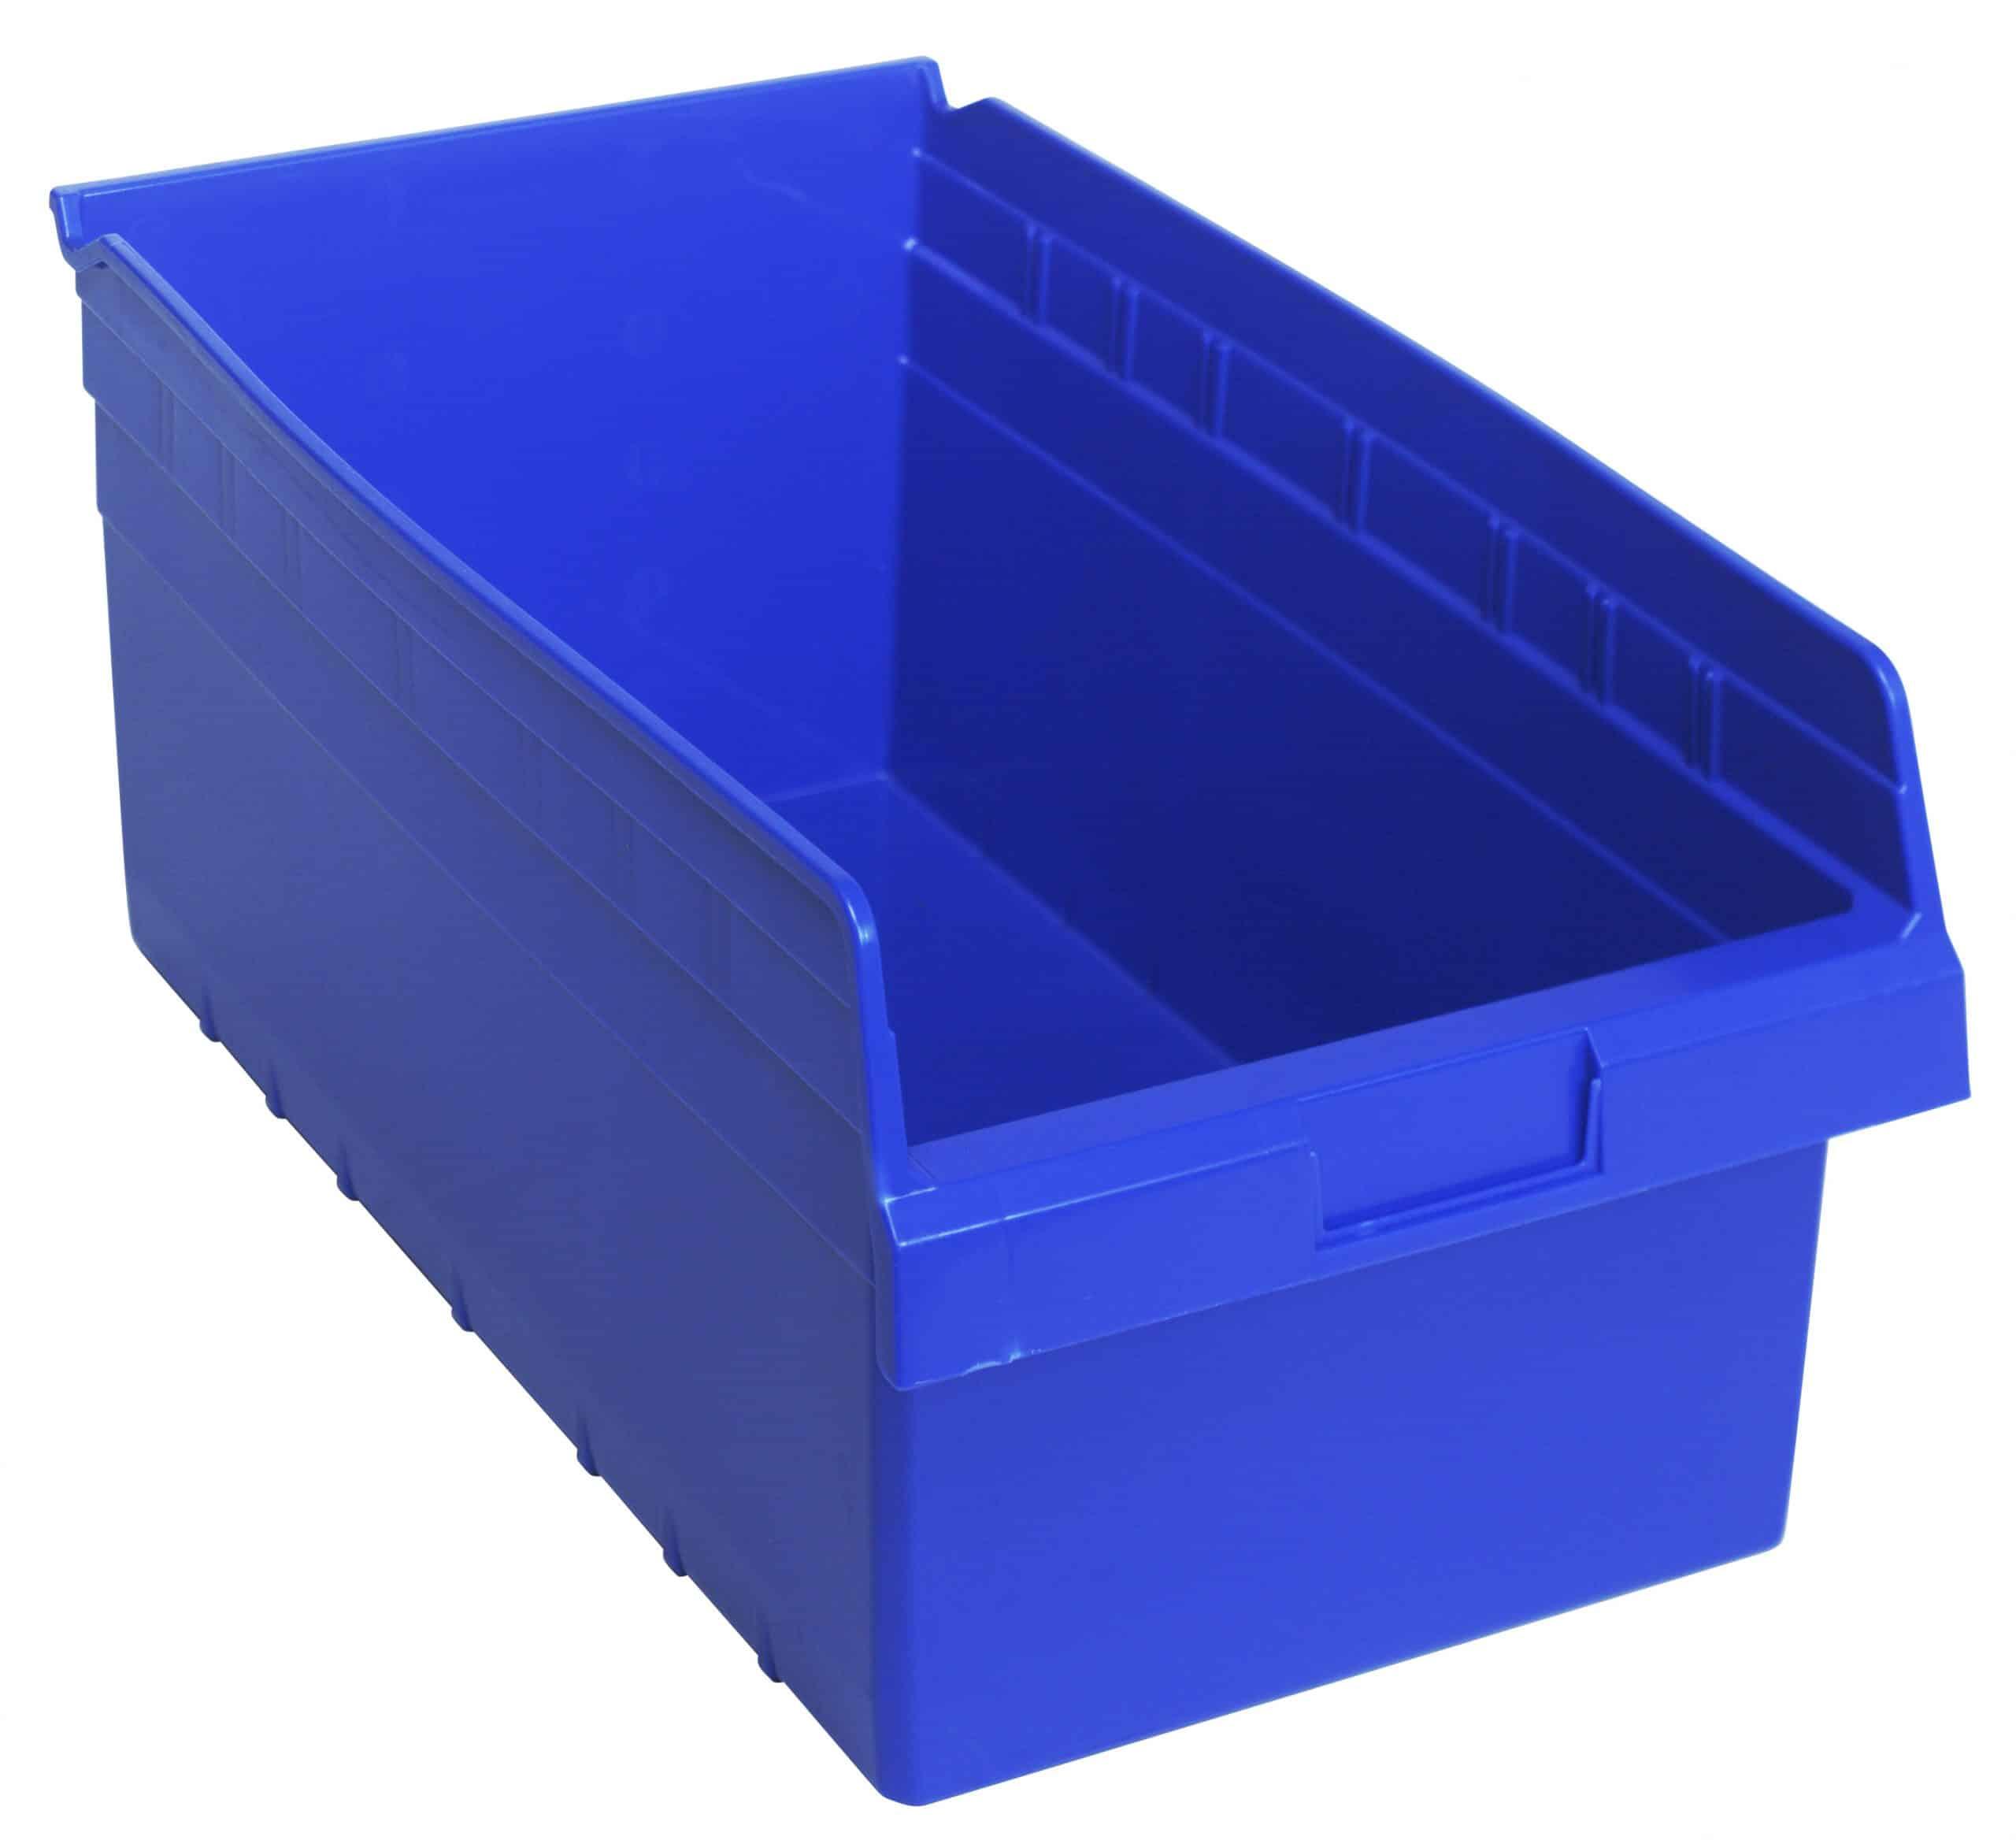 QSB810 blue